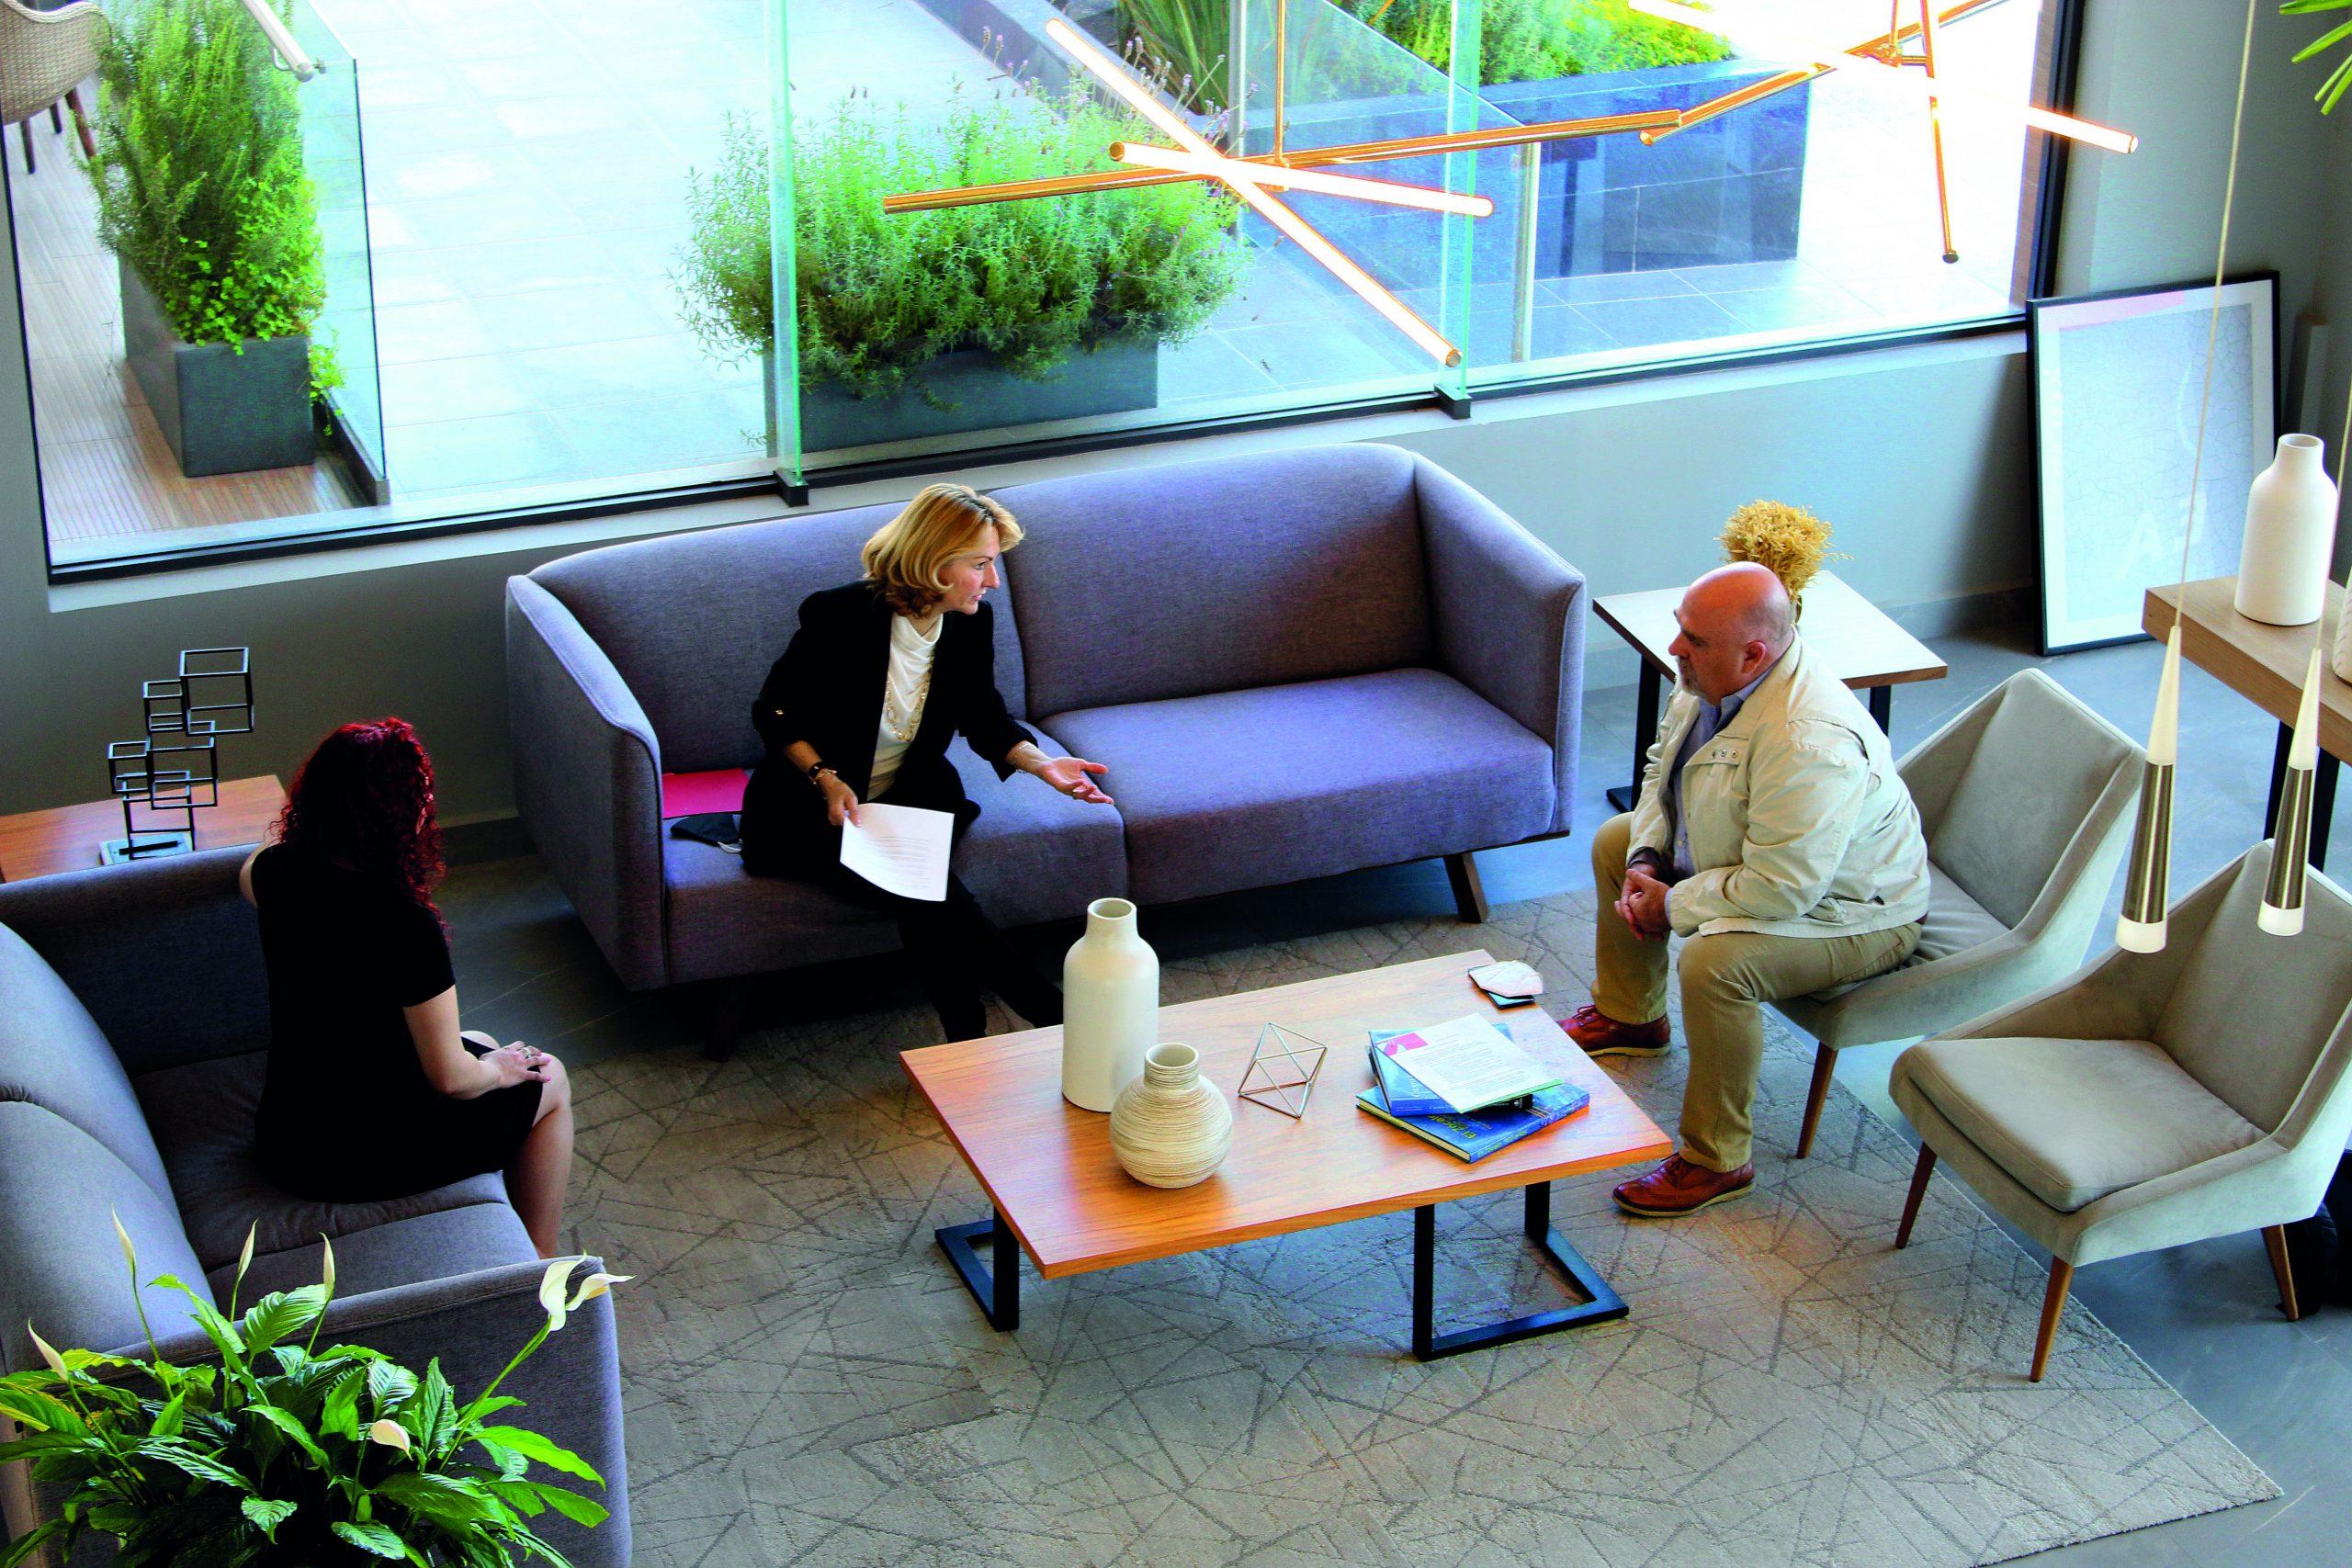 Silvia Cantero de La Guía Inmobiliaria conversando con Uberto Lammoglia y Ariadna Diaz, directora de Plaza de Grupo Urbania